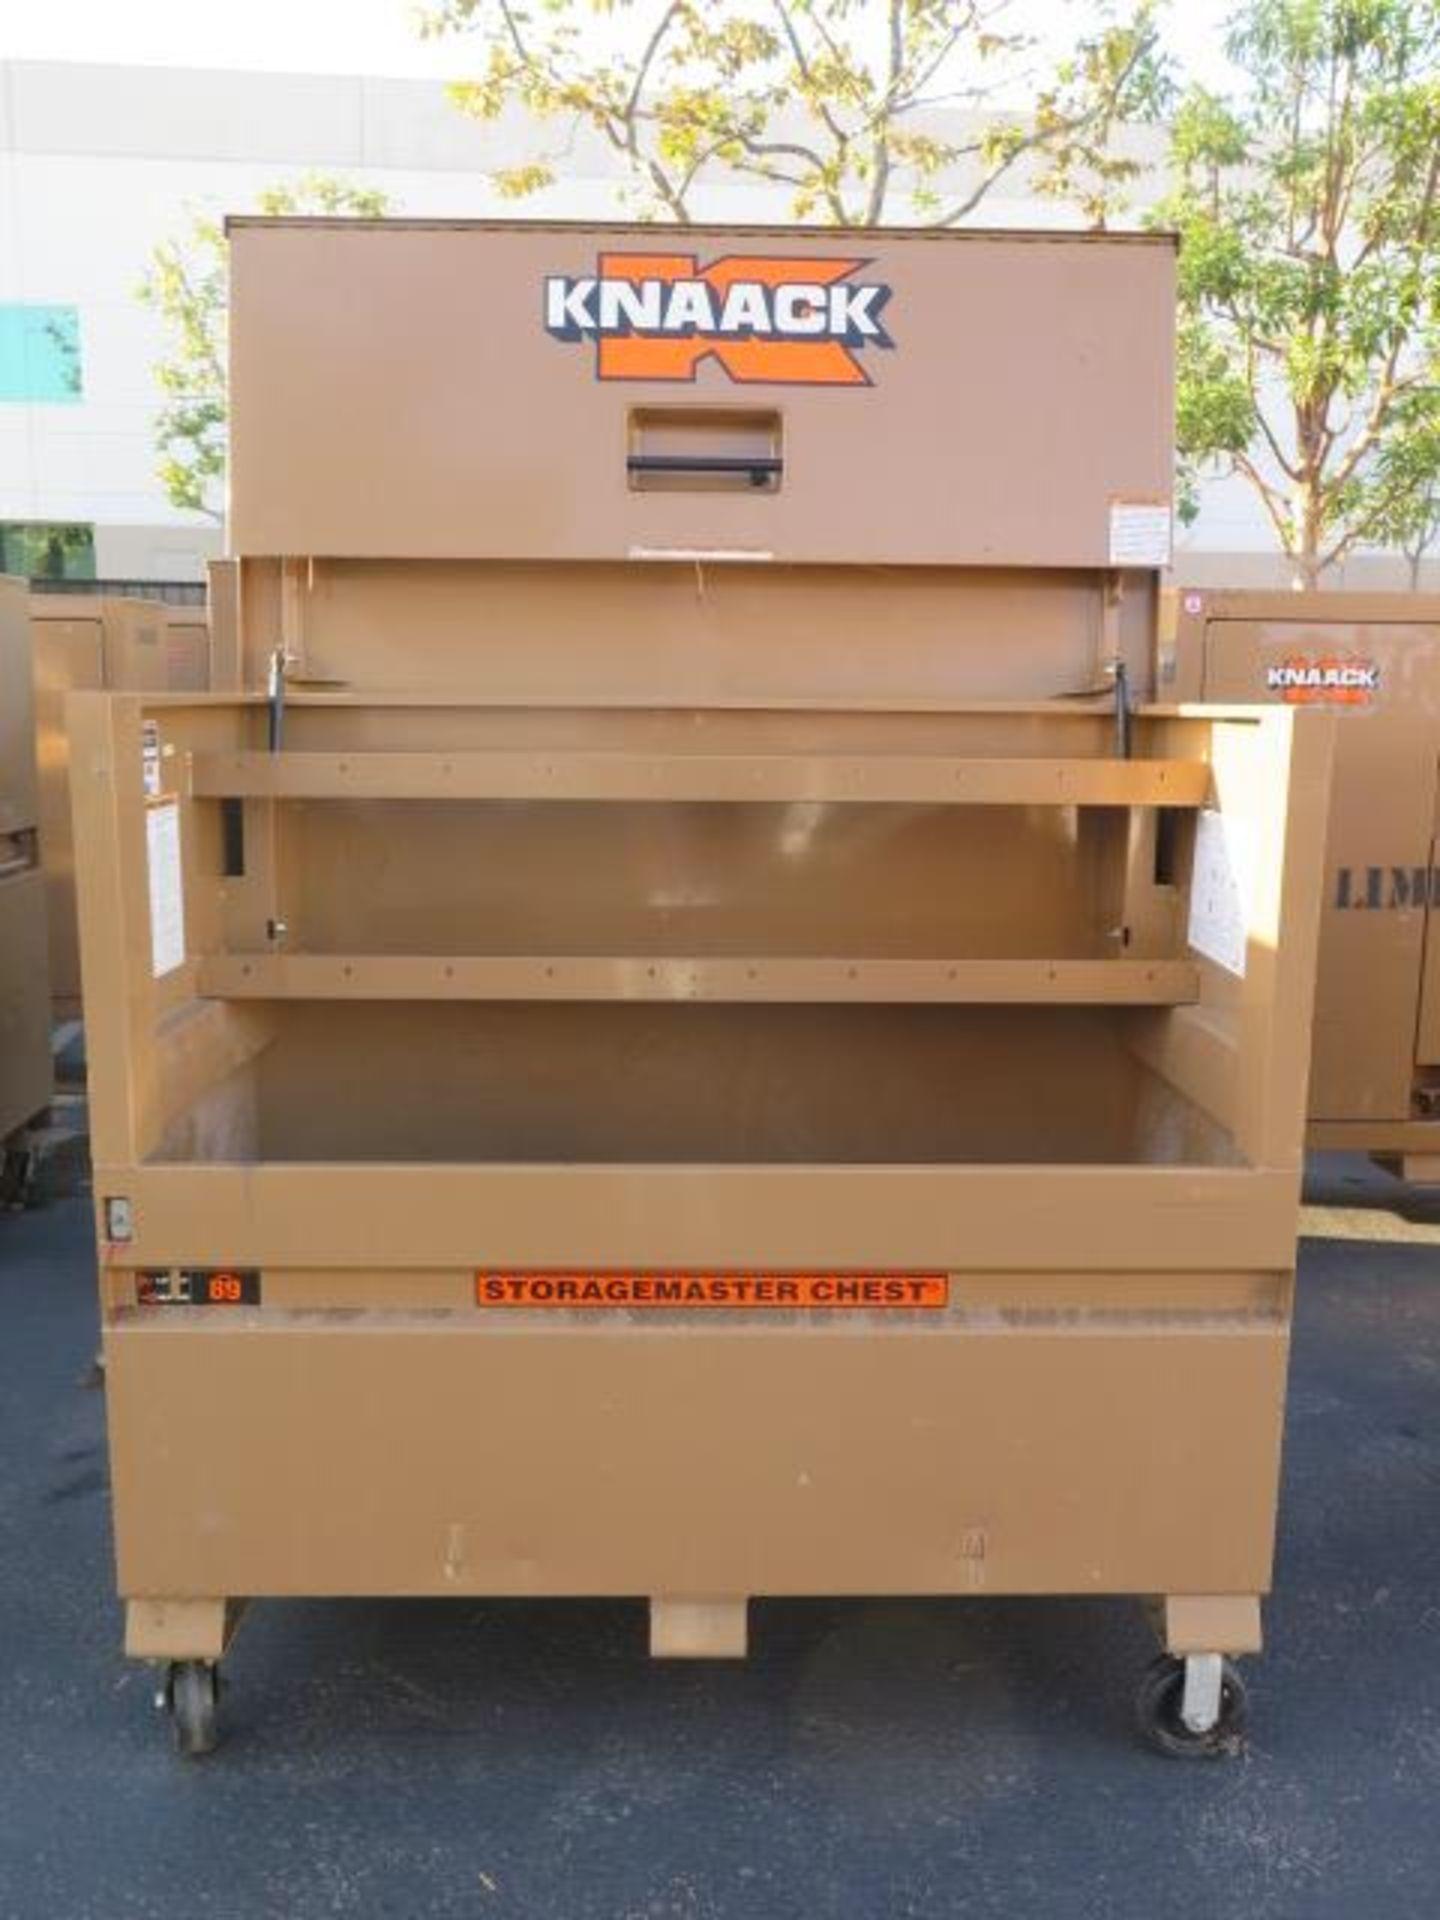 Knaack mdl. 89 Storagemaster Rolling Job Box (SOLD AS-IS - NO WARRANTY) - Image 5 of 11